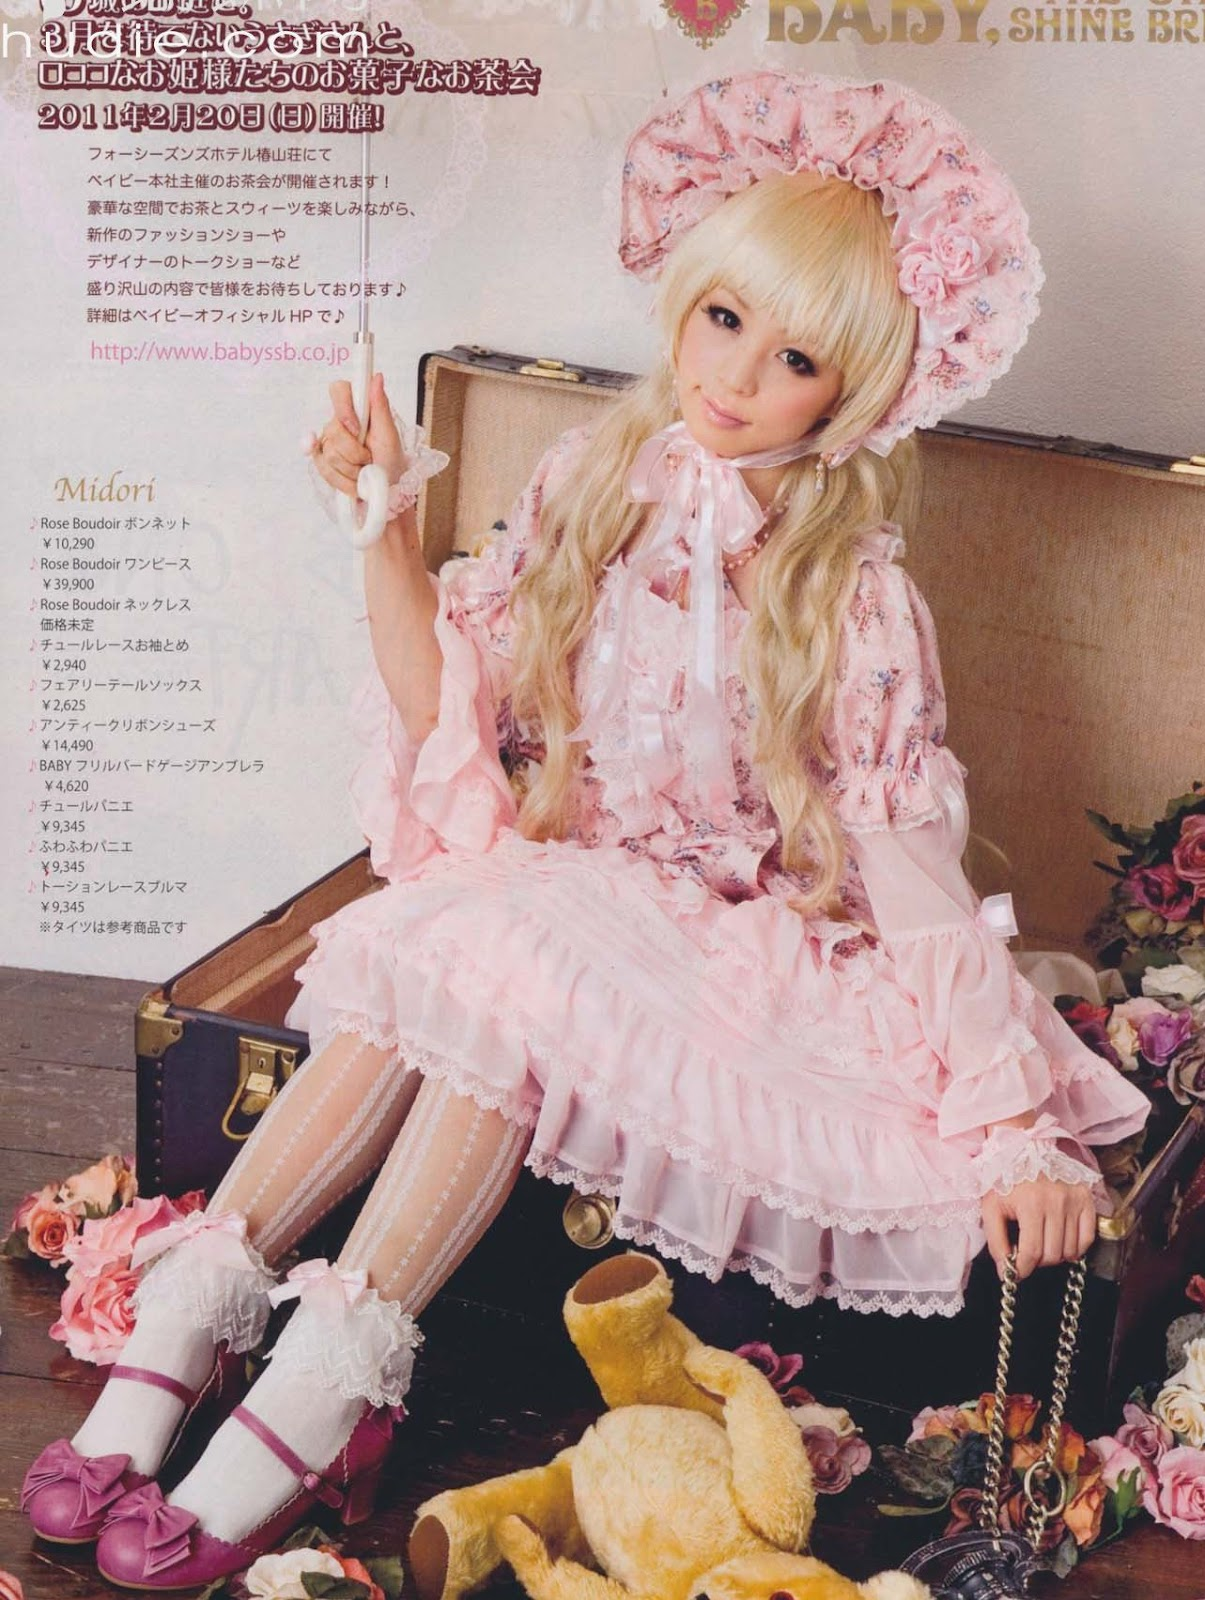 Frilly Sissy Tumblr with regard to f yeah lolita: ask miss caro-chan: short socks?